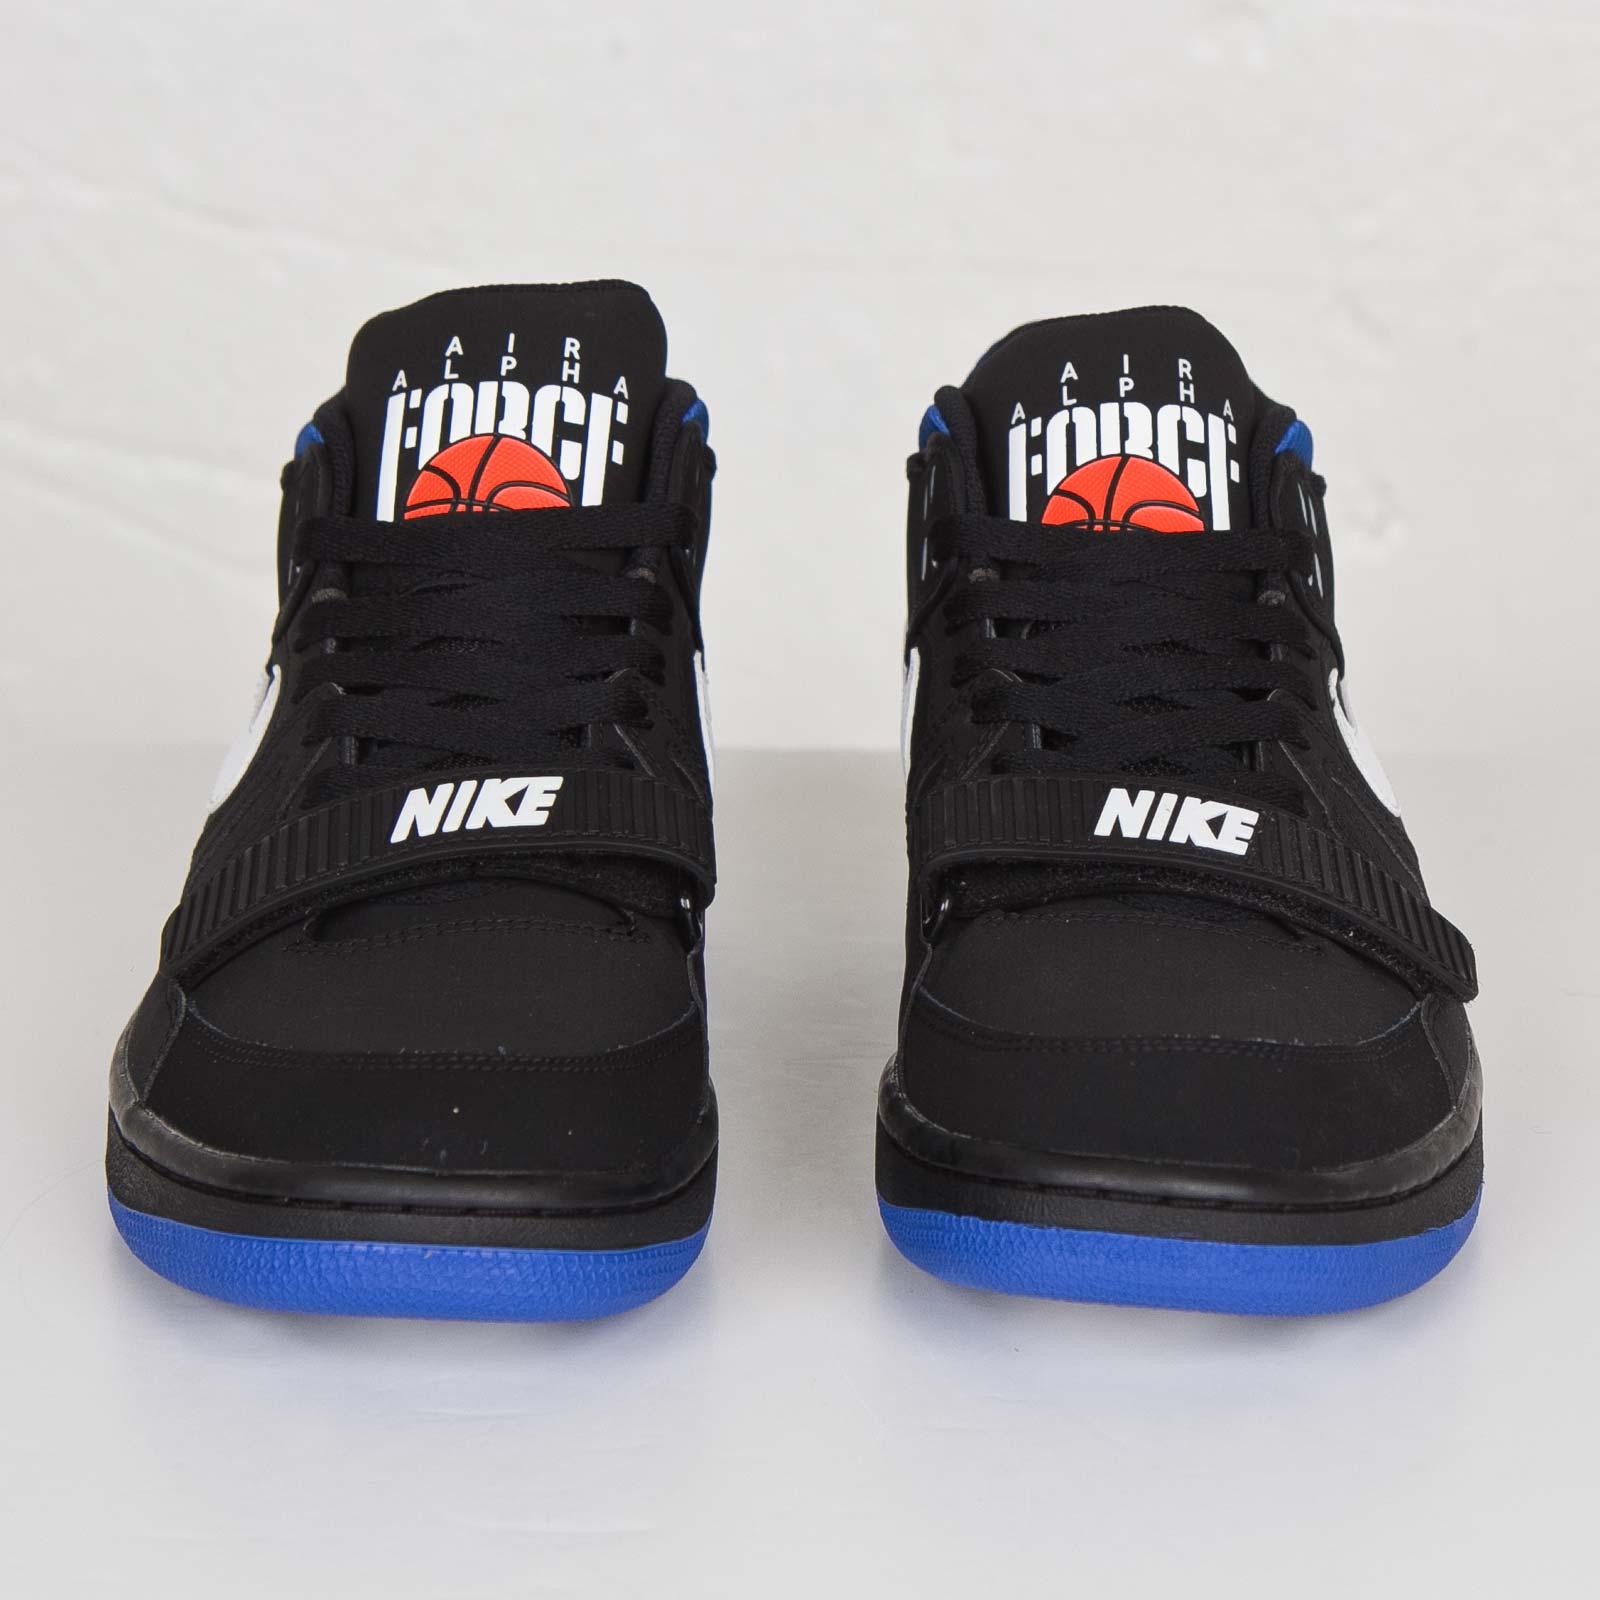 nike air alpha force 2